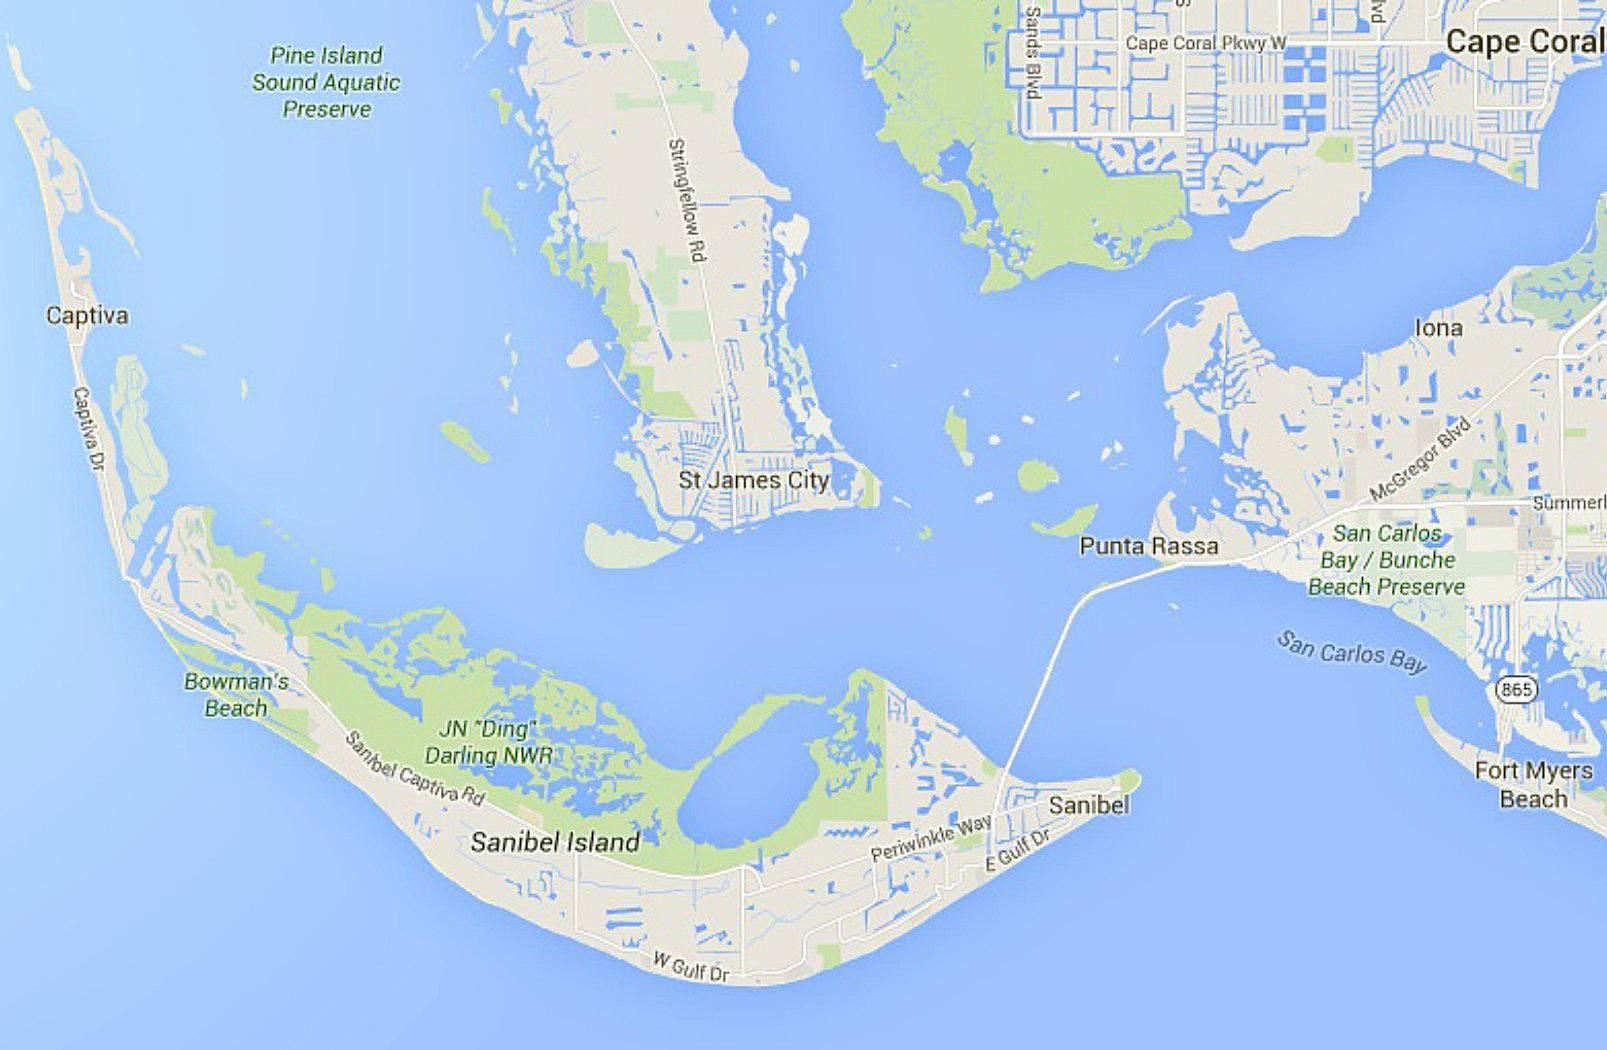 Maps Of Florida: Orlando, Tampa, Miami, Keys, And More - Emerald Coast Florida Map